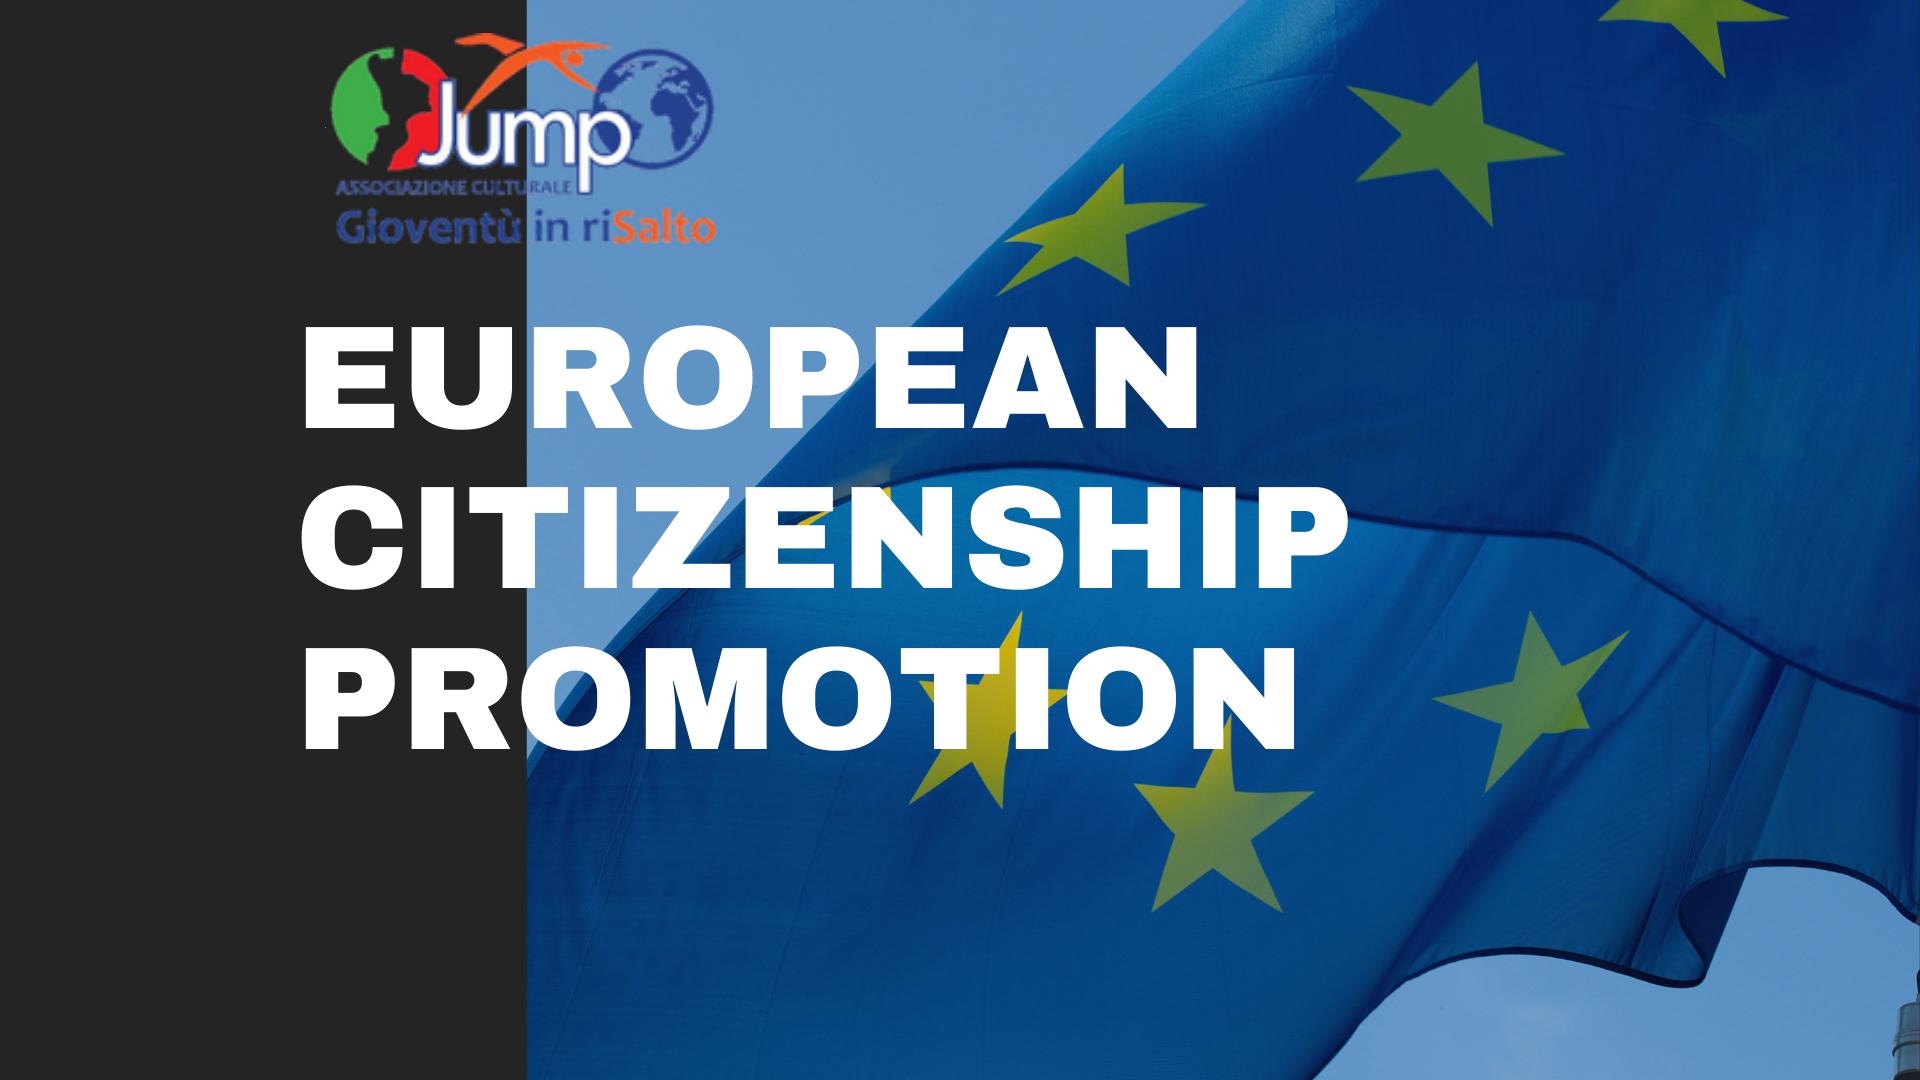 European Citizenship Promotion